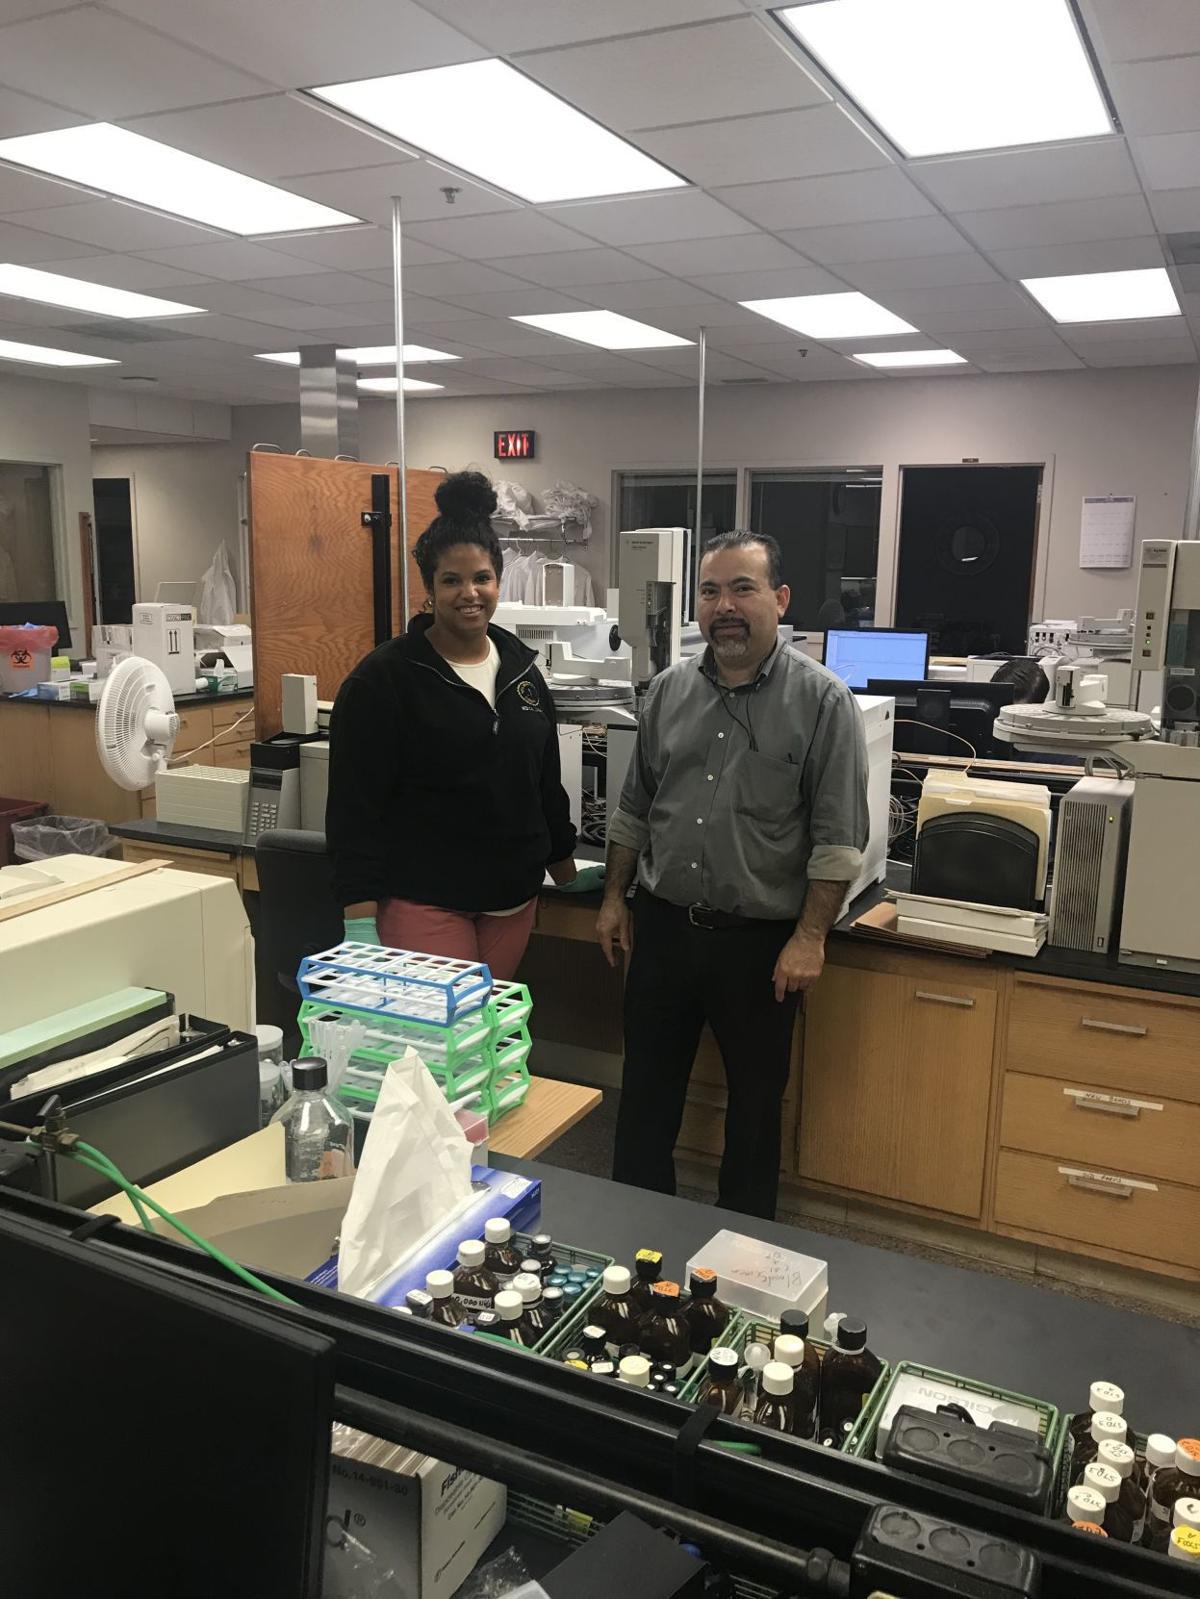 Milwaukee County medical examiner staff